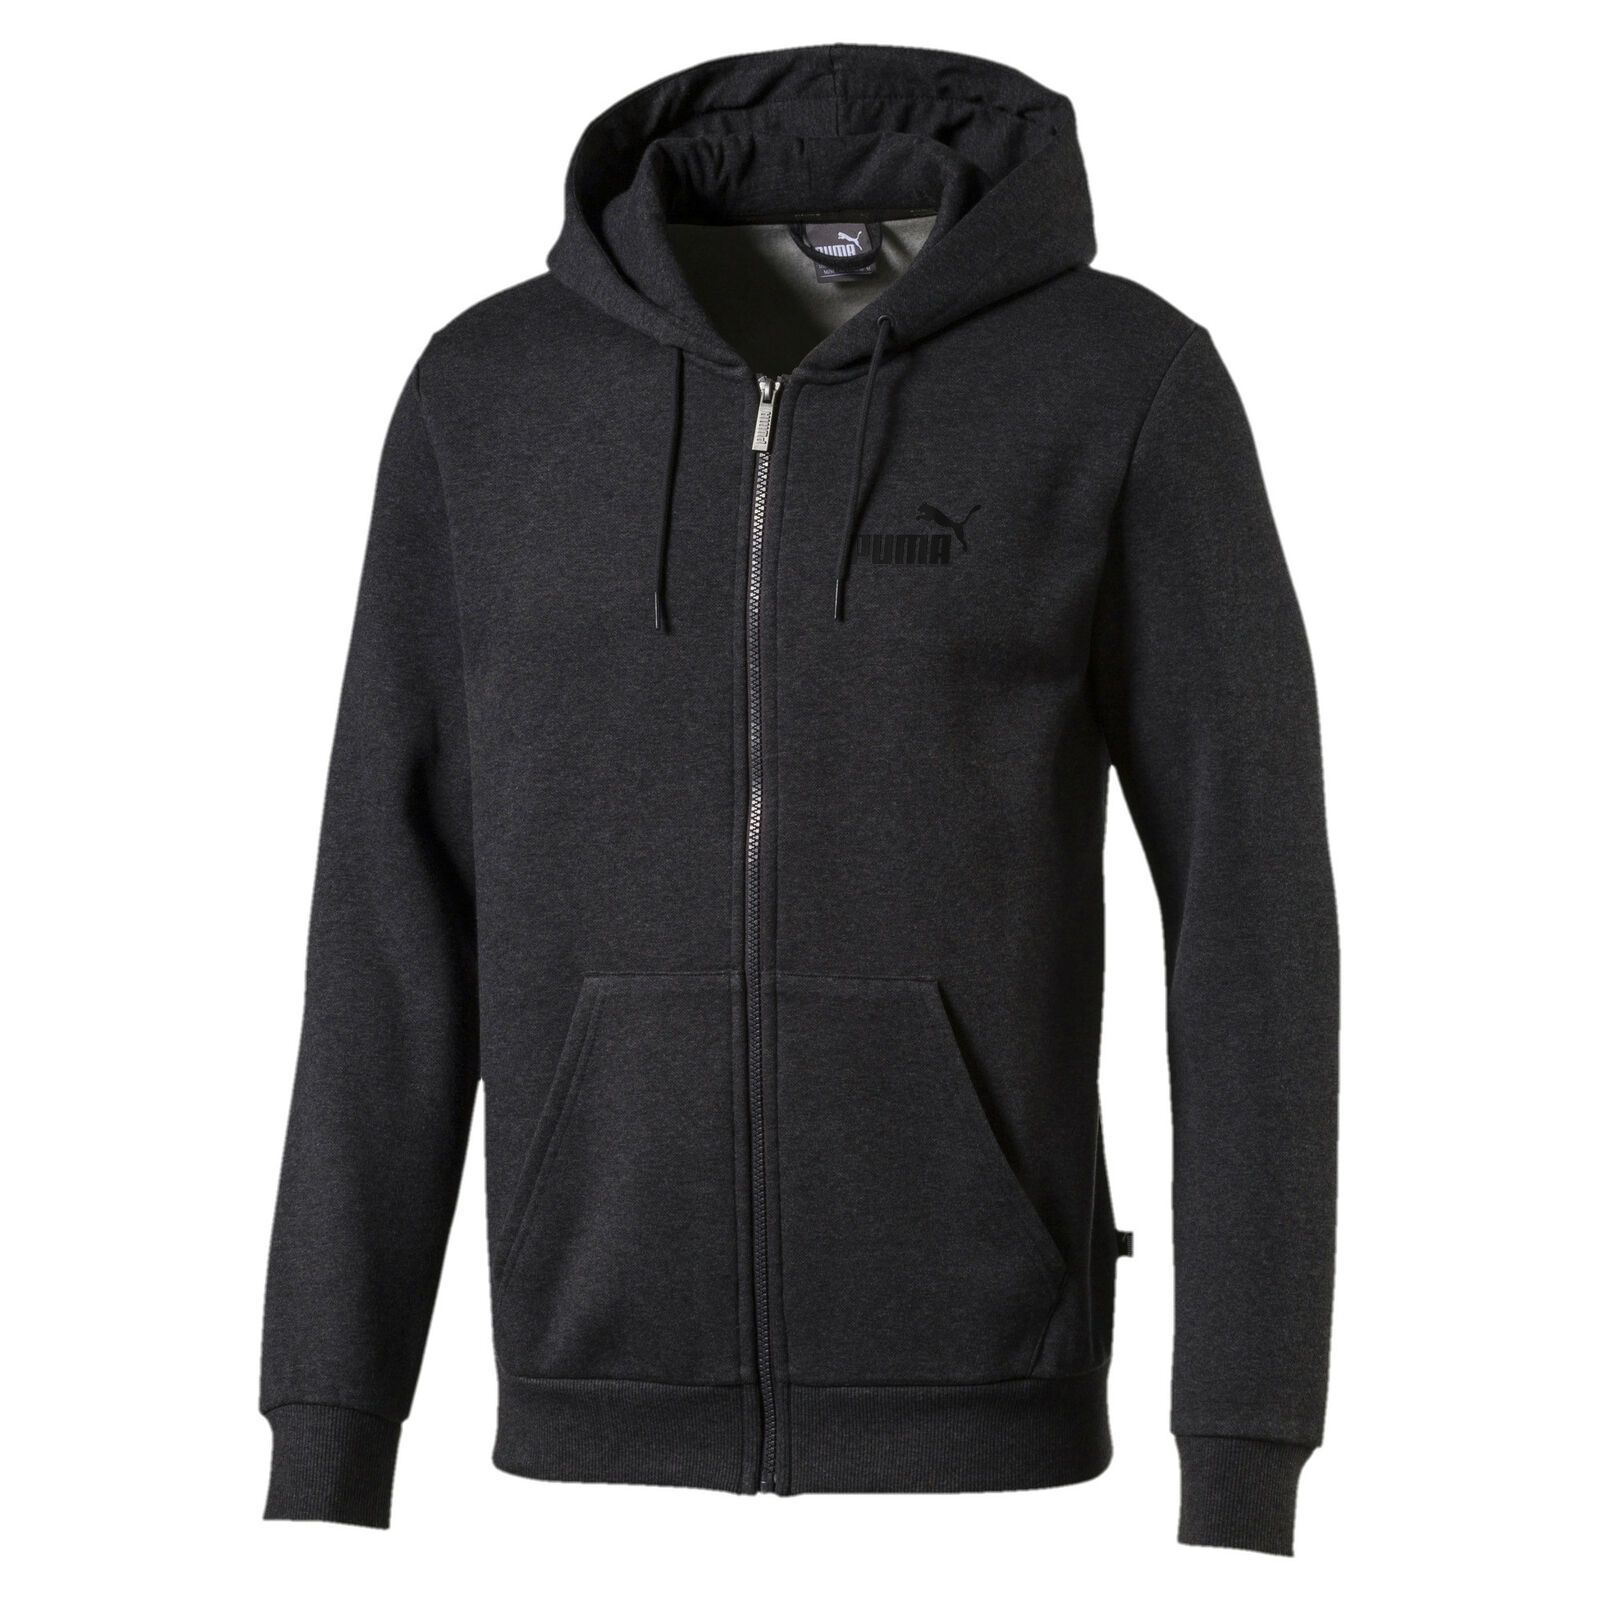 PUMA Essentials+ Men's Fleece Hooded Jacket Men Sweat Basics